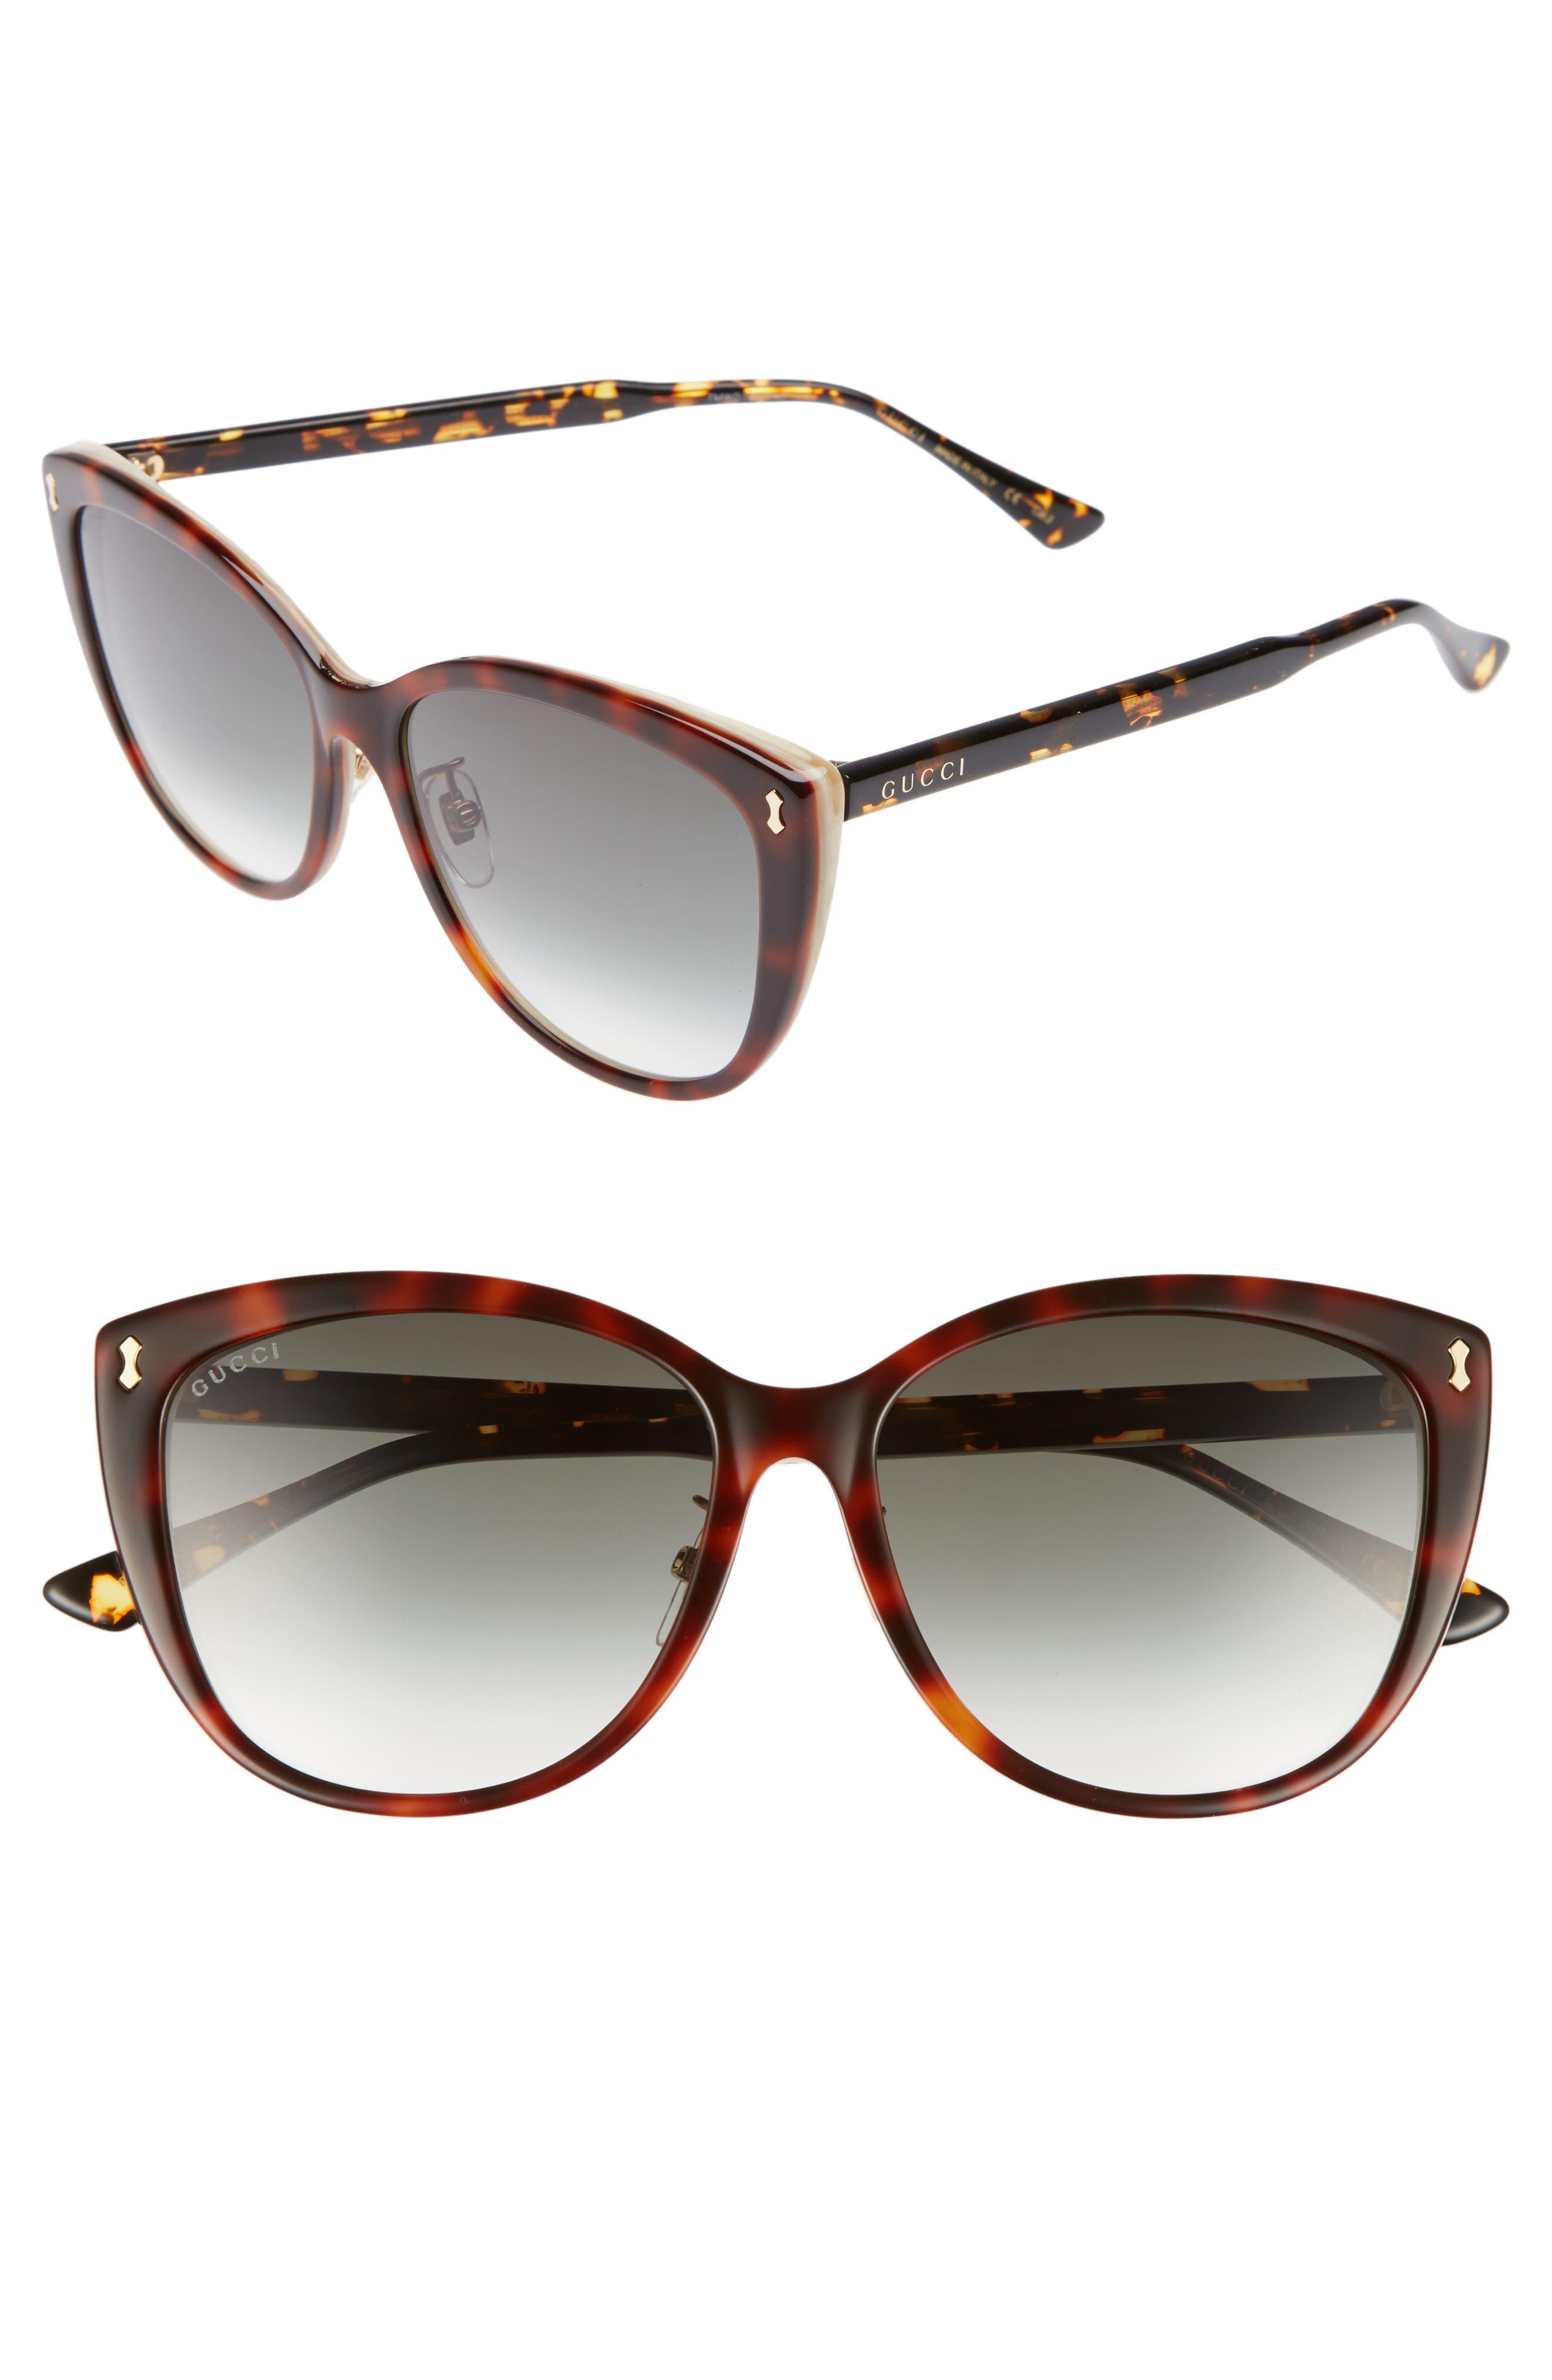 58mm Cat Eye Sunglasses,                             Main thumbnail 1, color,                             HAVANA